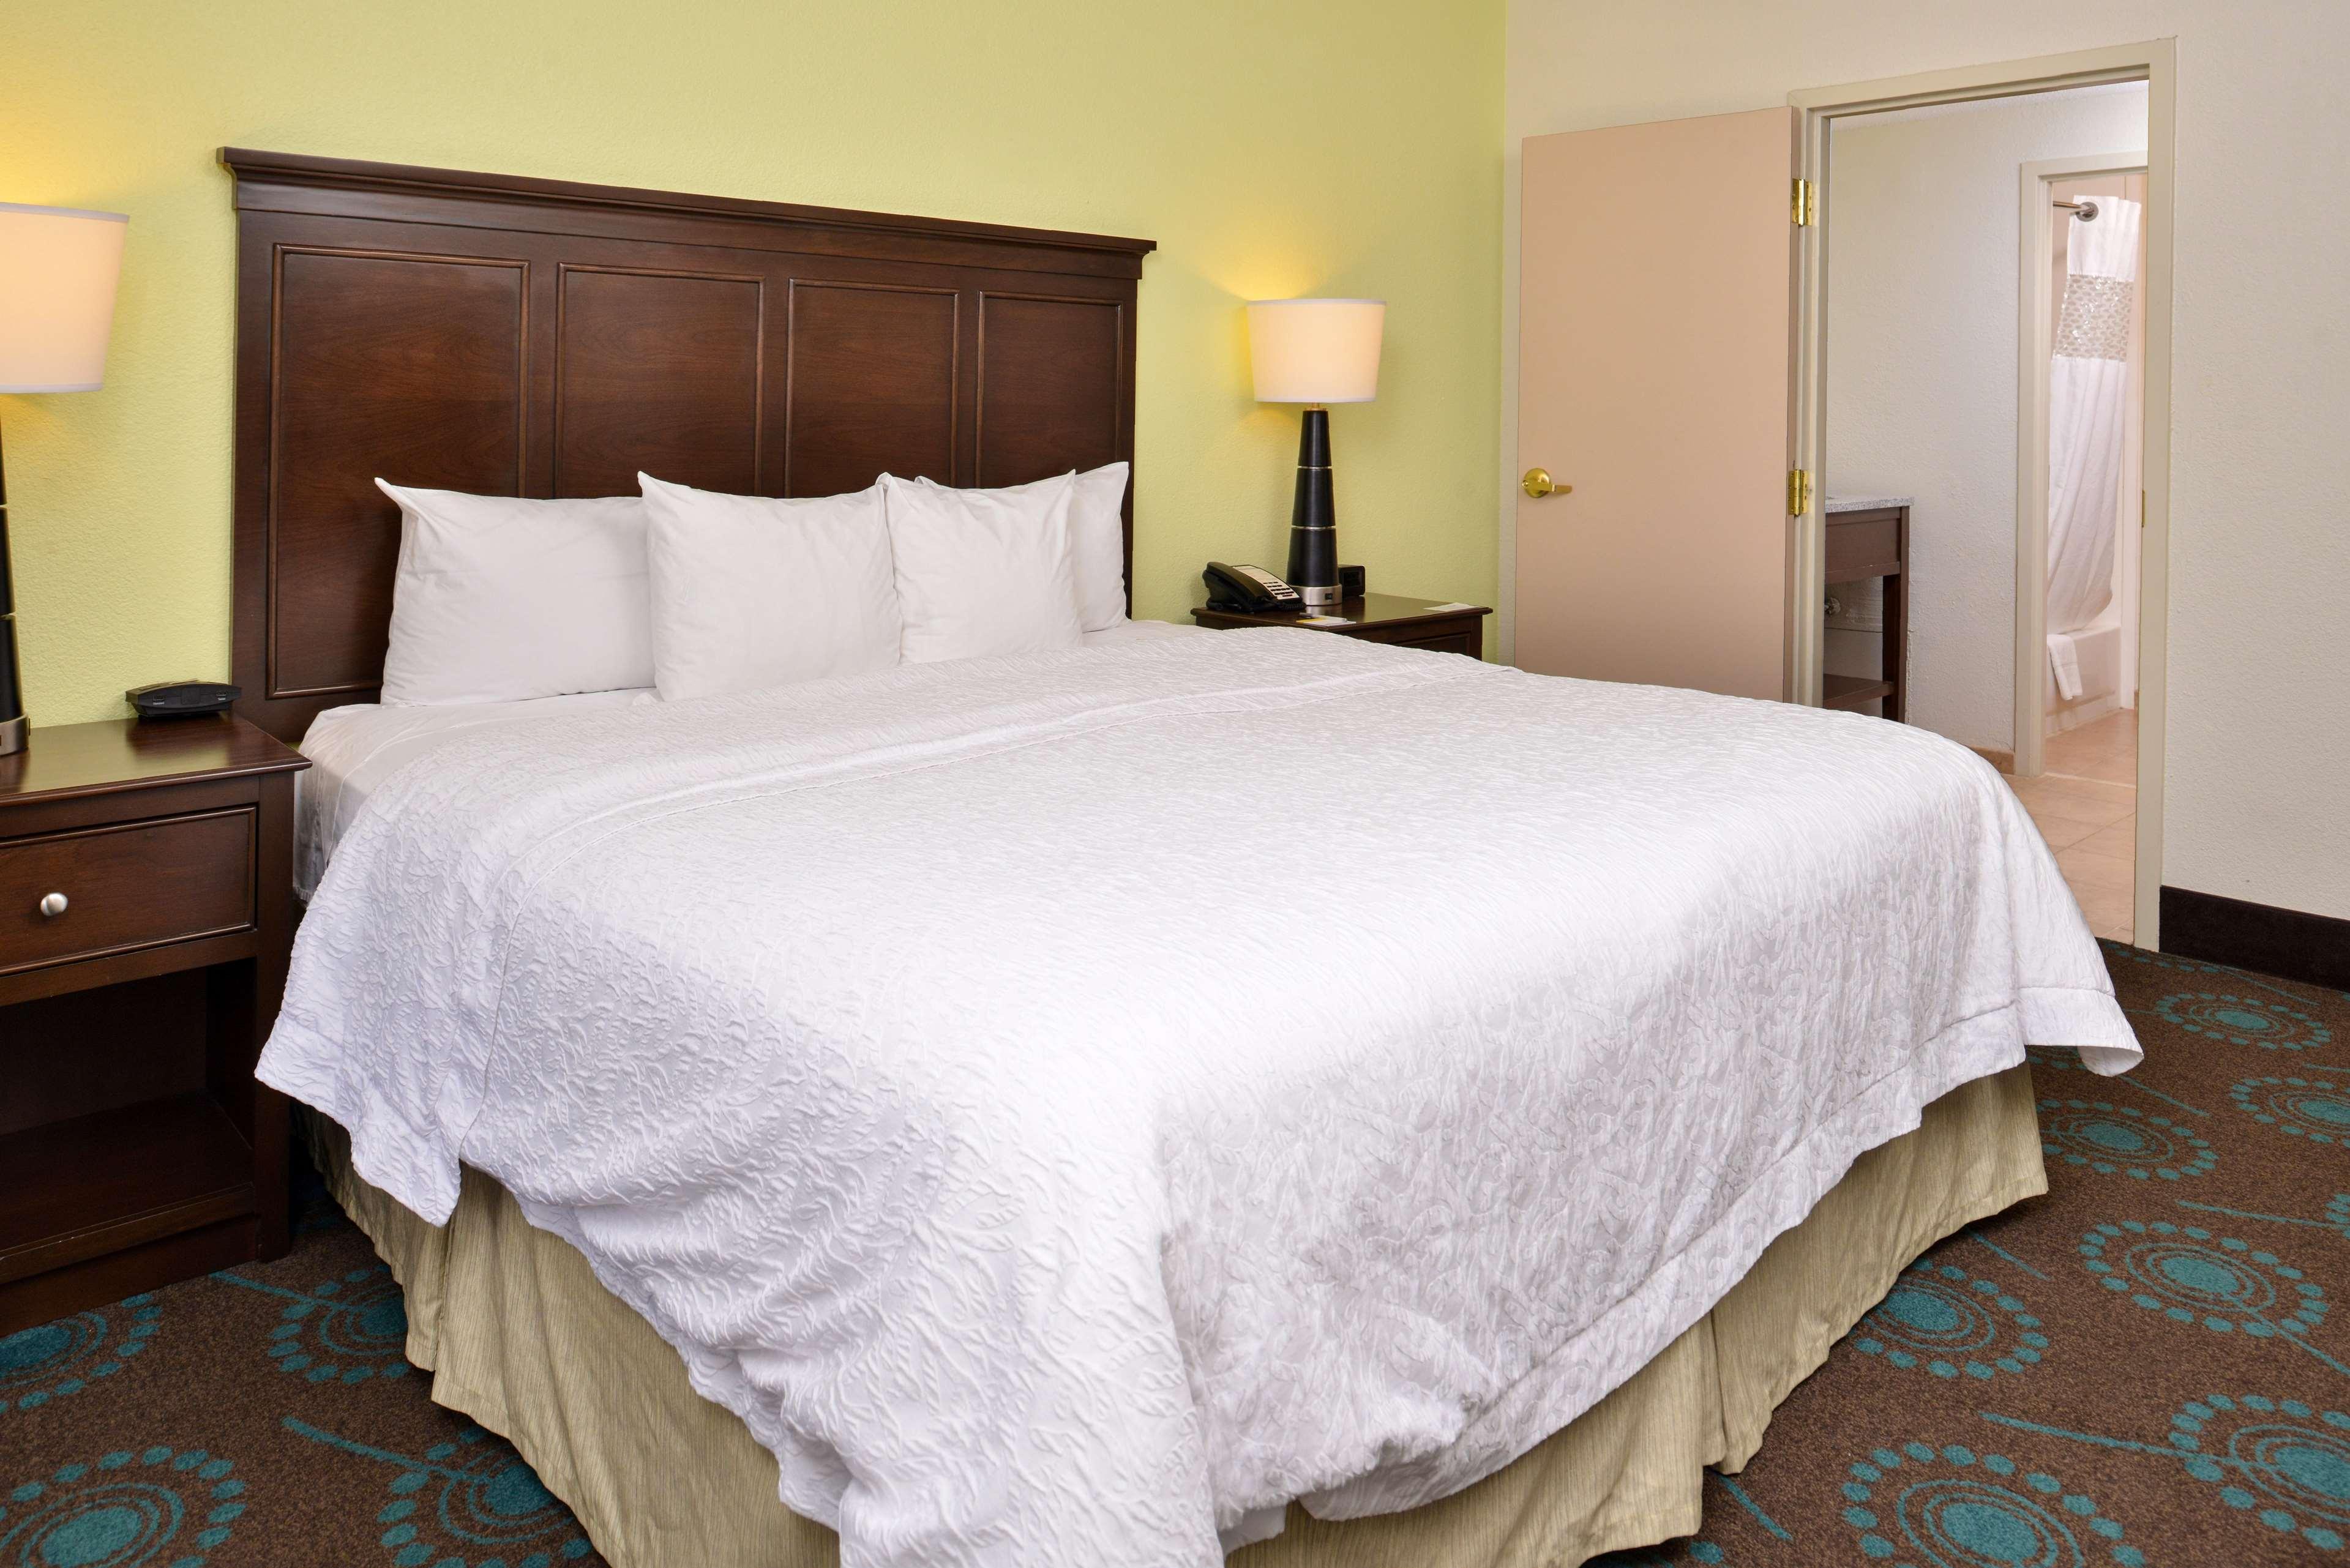 Hampton Inn & Suites Newport News (Oyster Point) image 37